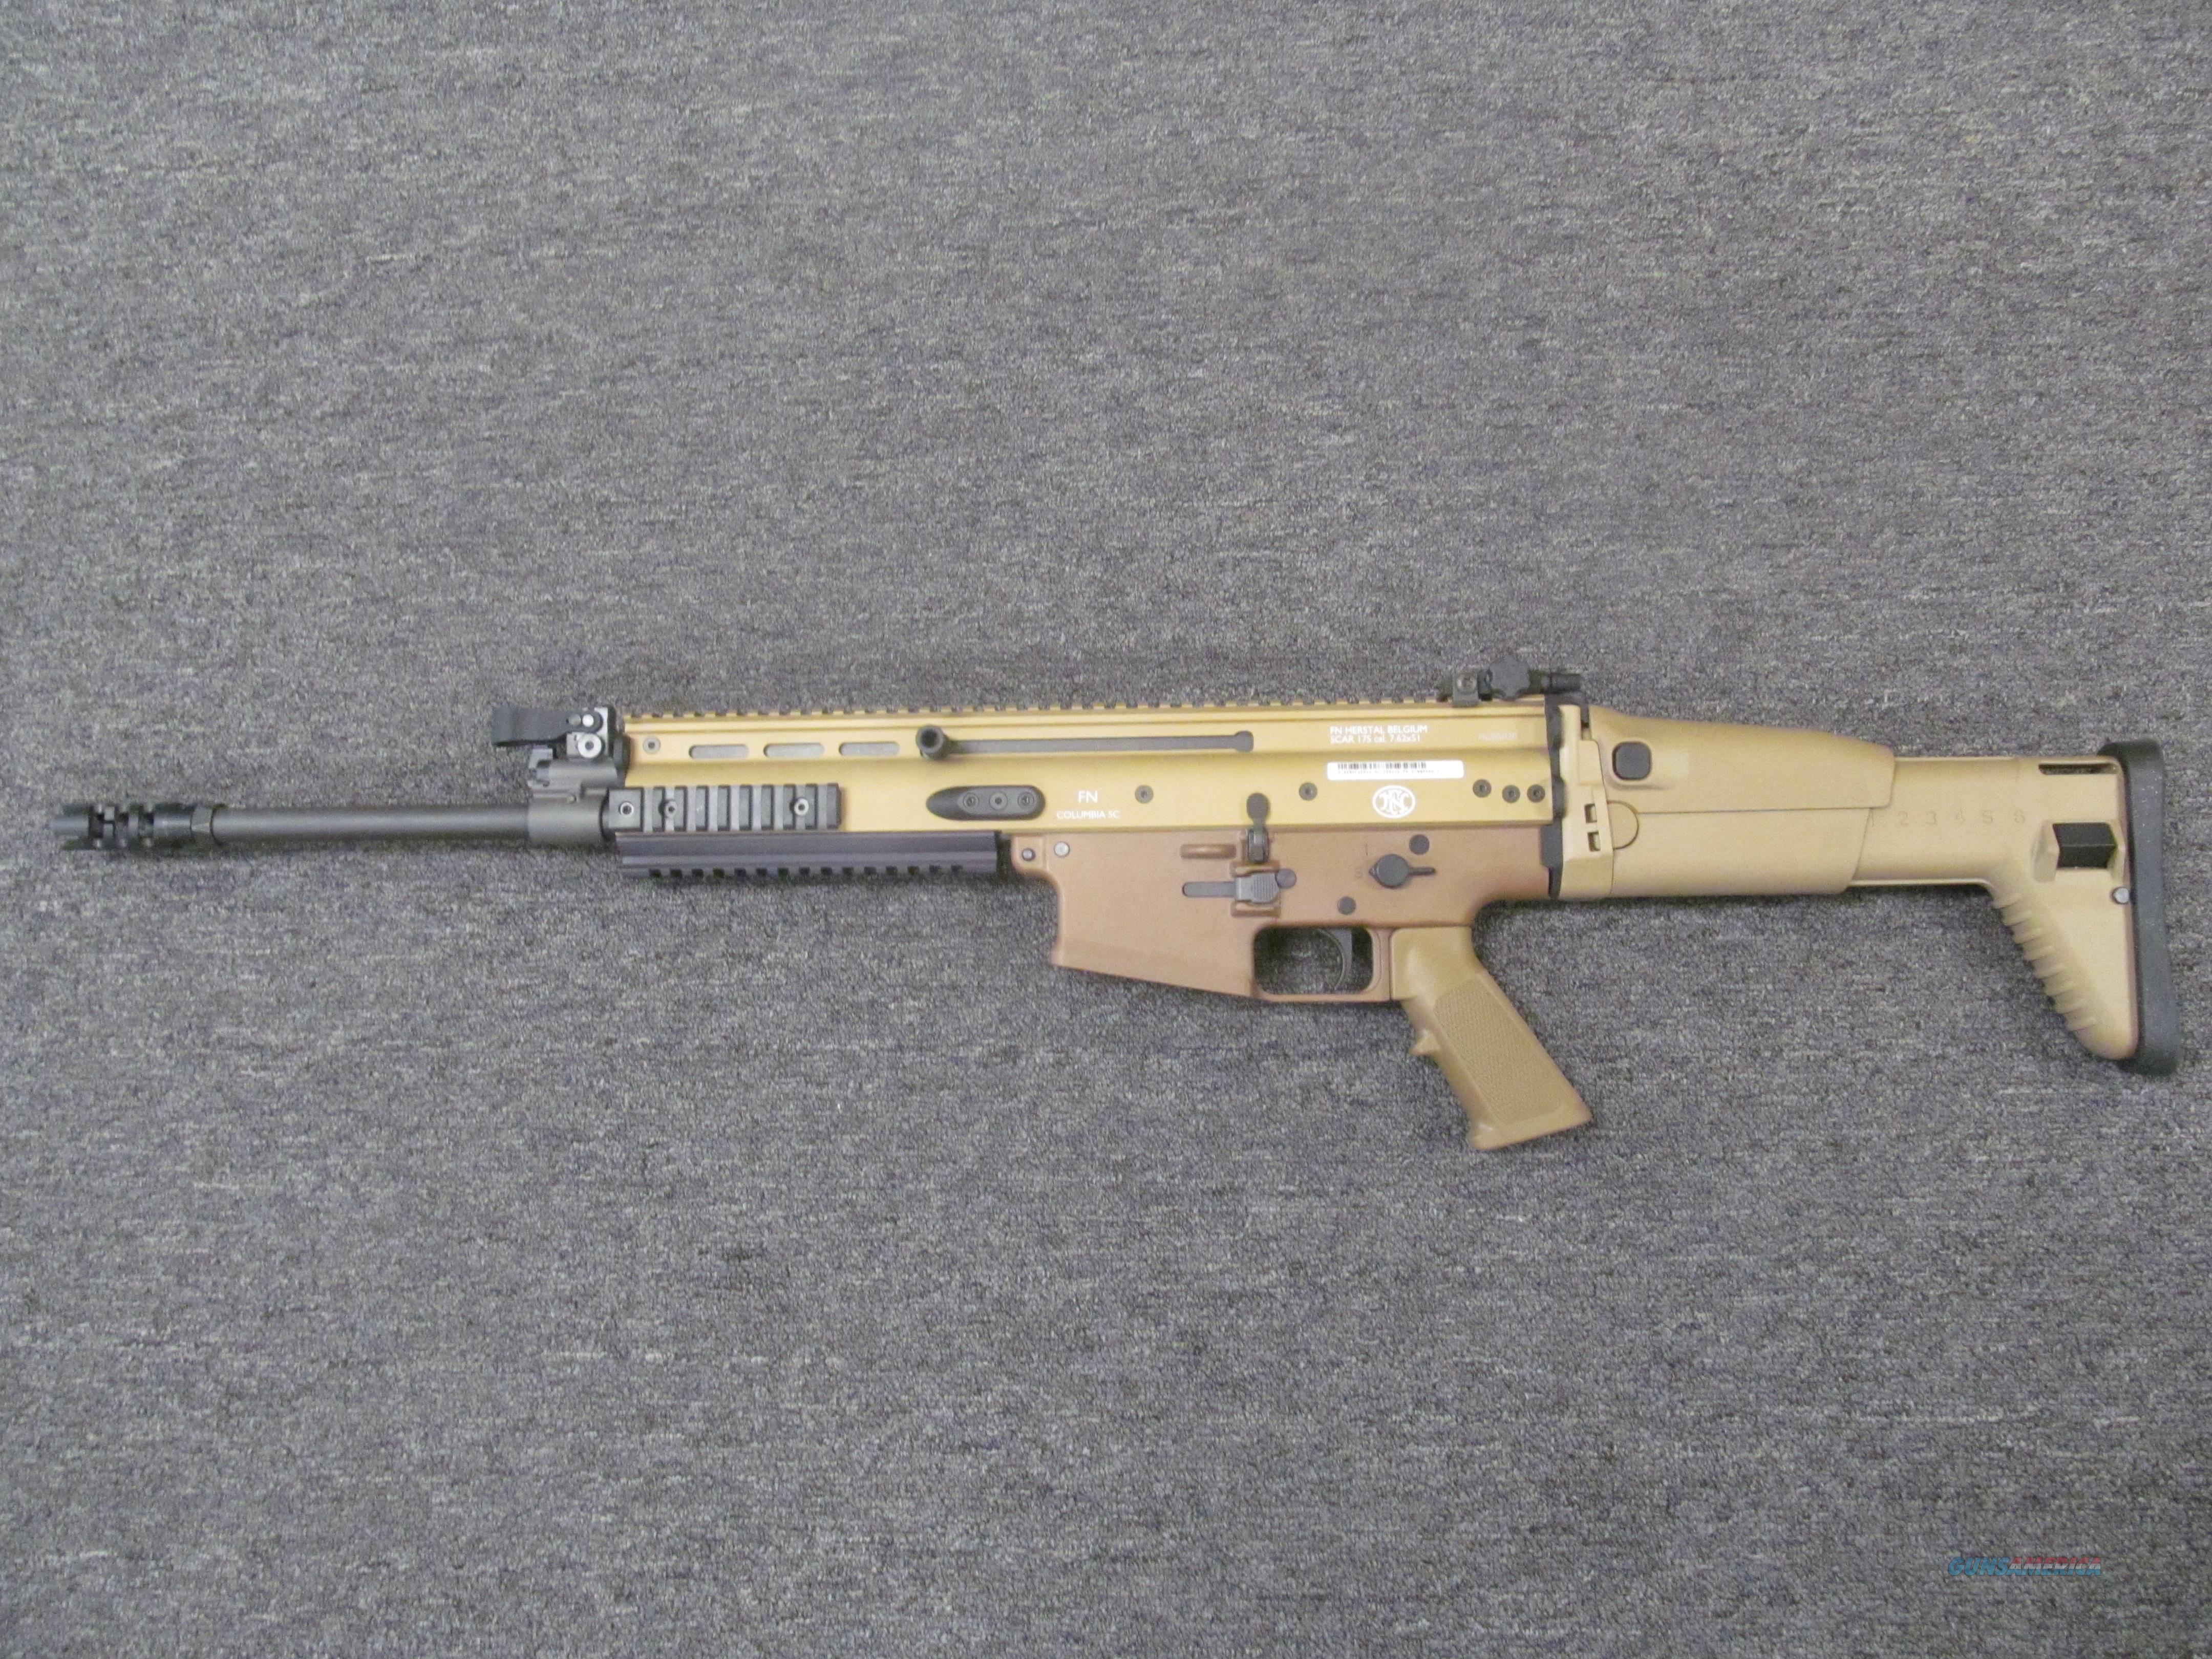 FNH SCAR 17S w/FDE Finish  Guns > Rifles > FNH - Fabrique Nationale (FN) Rifles > Semi-auto > SCAR